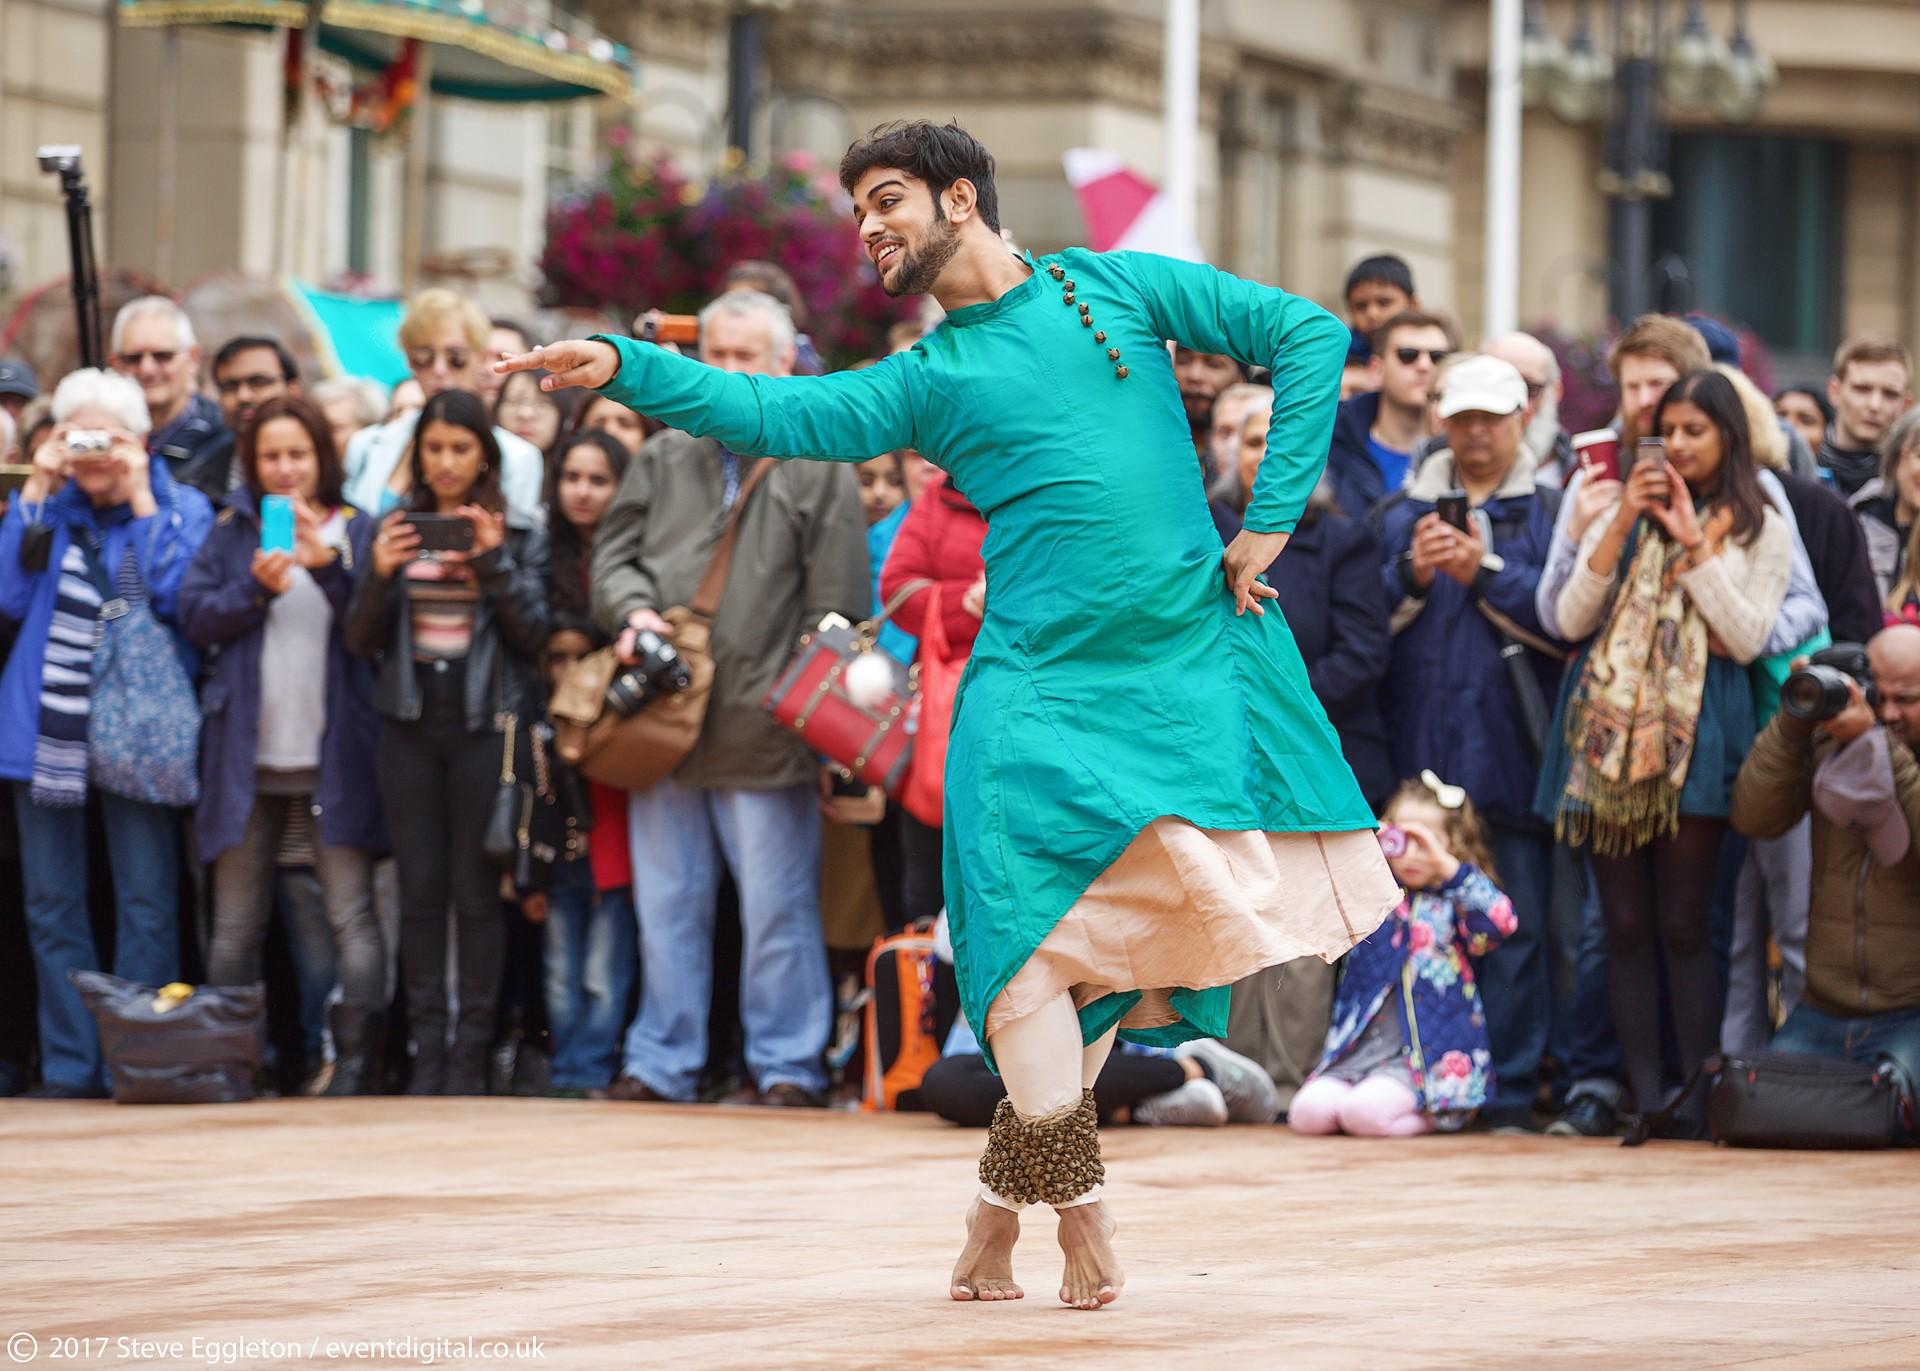 Birmingham Weekender 2017, South Asian Medley 2, Photo by Steve Eggleton Event Digital .jpg